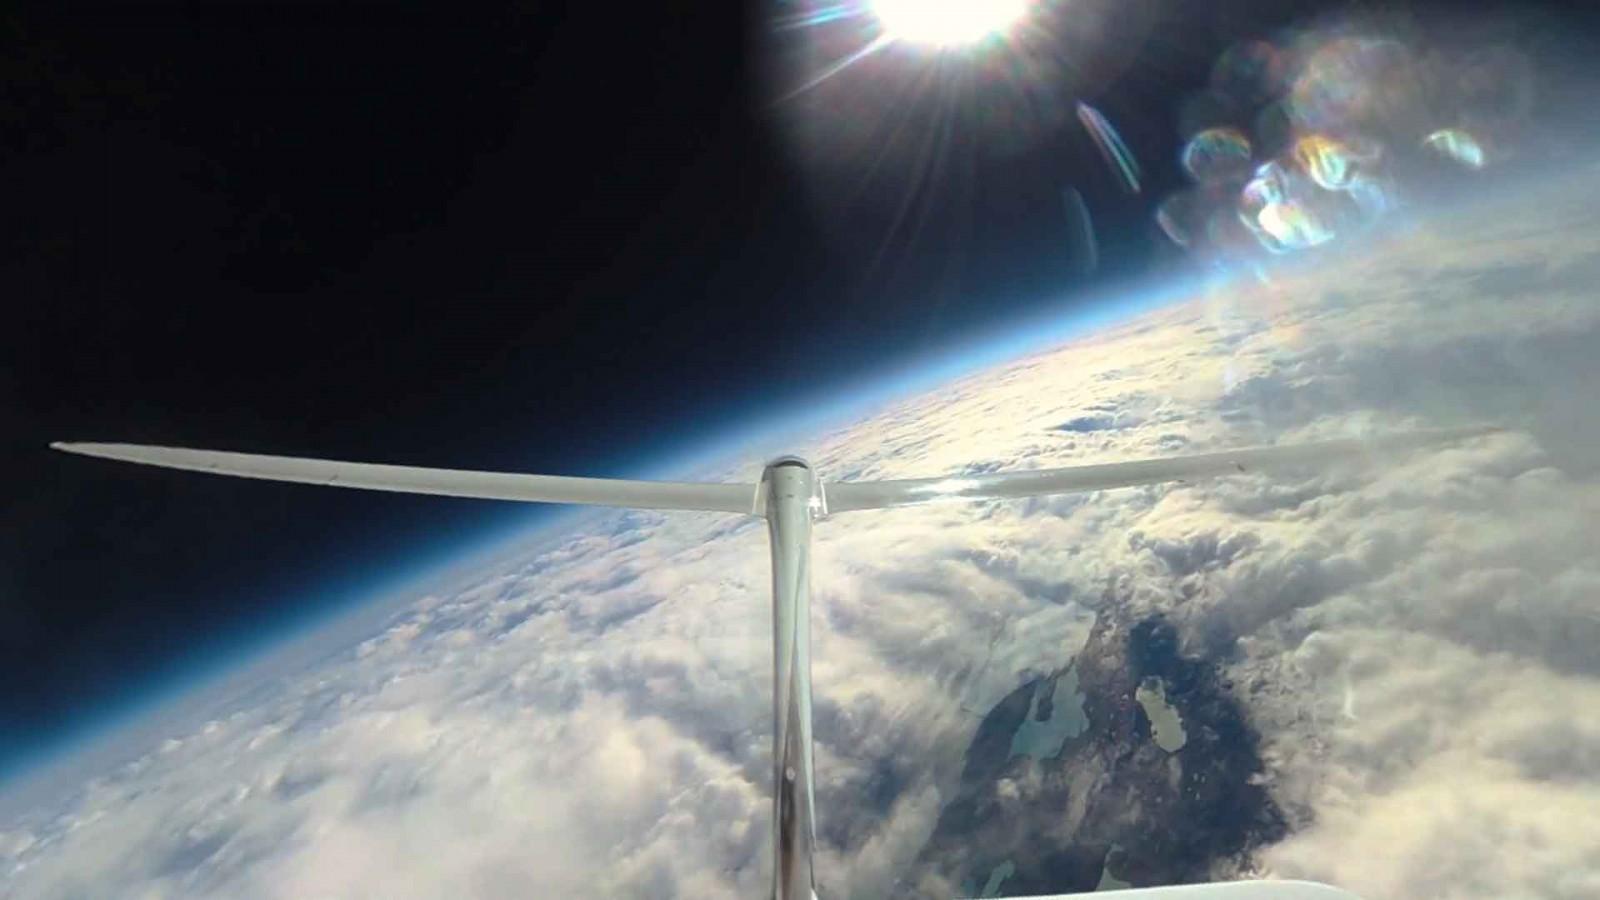 Perlan 2 Airbus record U2 SPY PLane